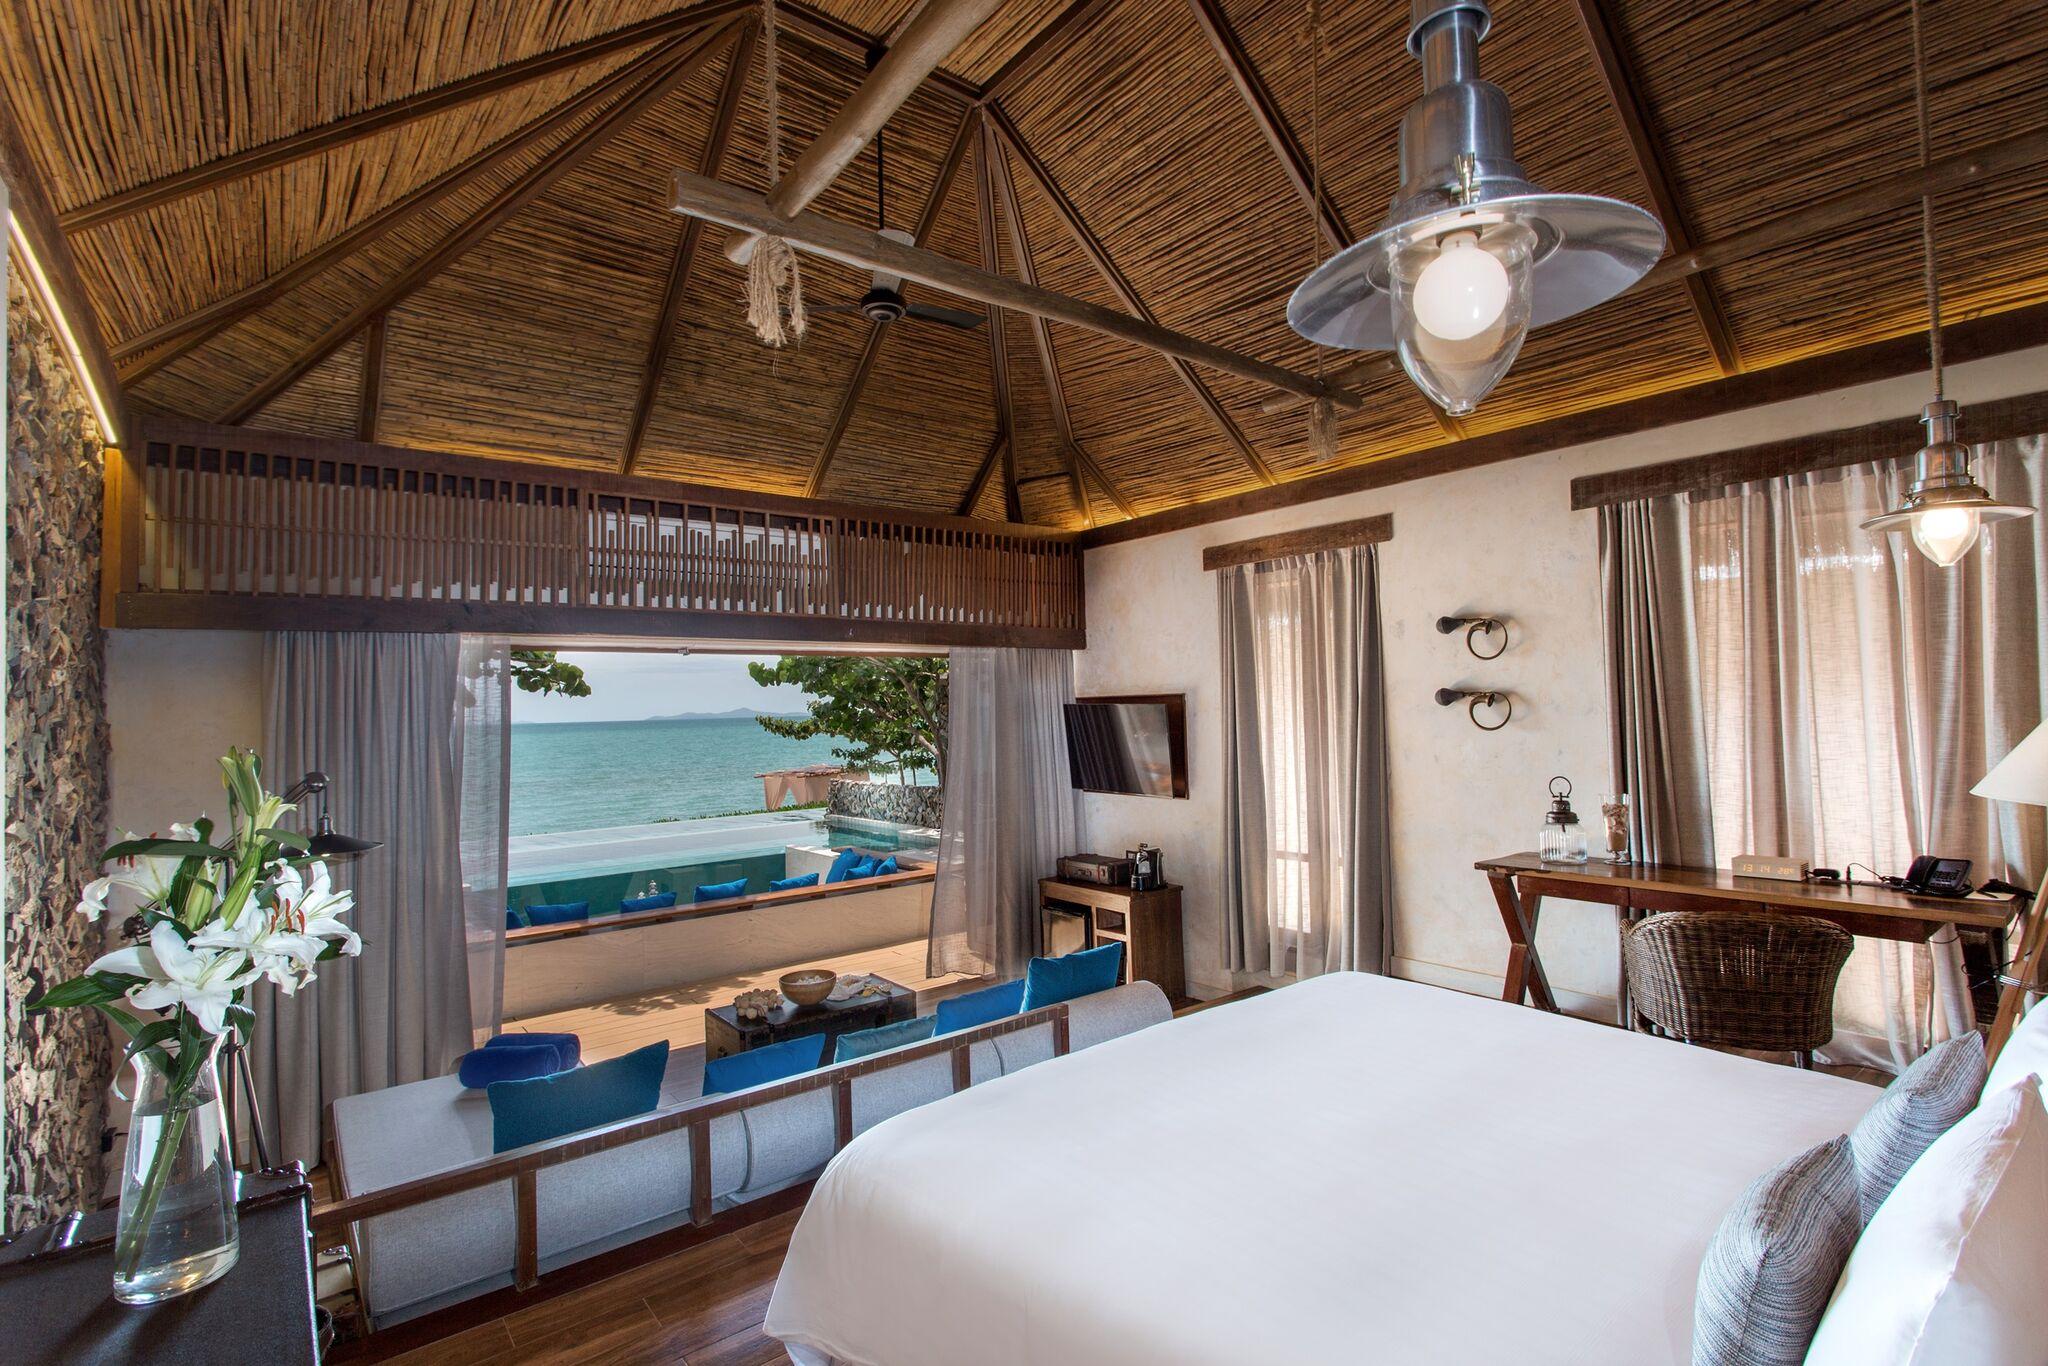 U Pattaya - Ruhe und Privatsphäre Strandresort